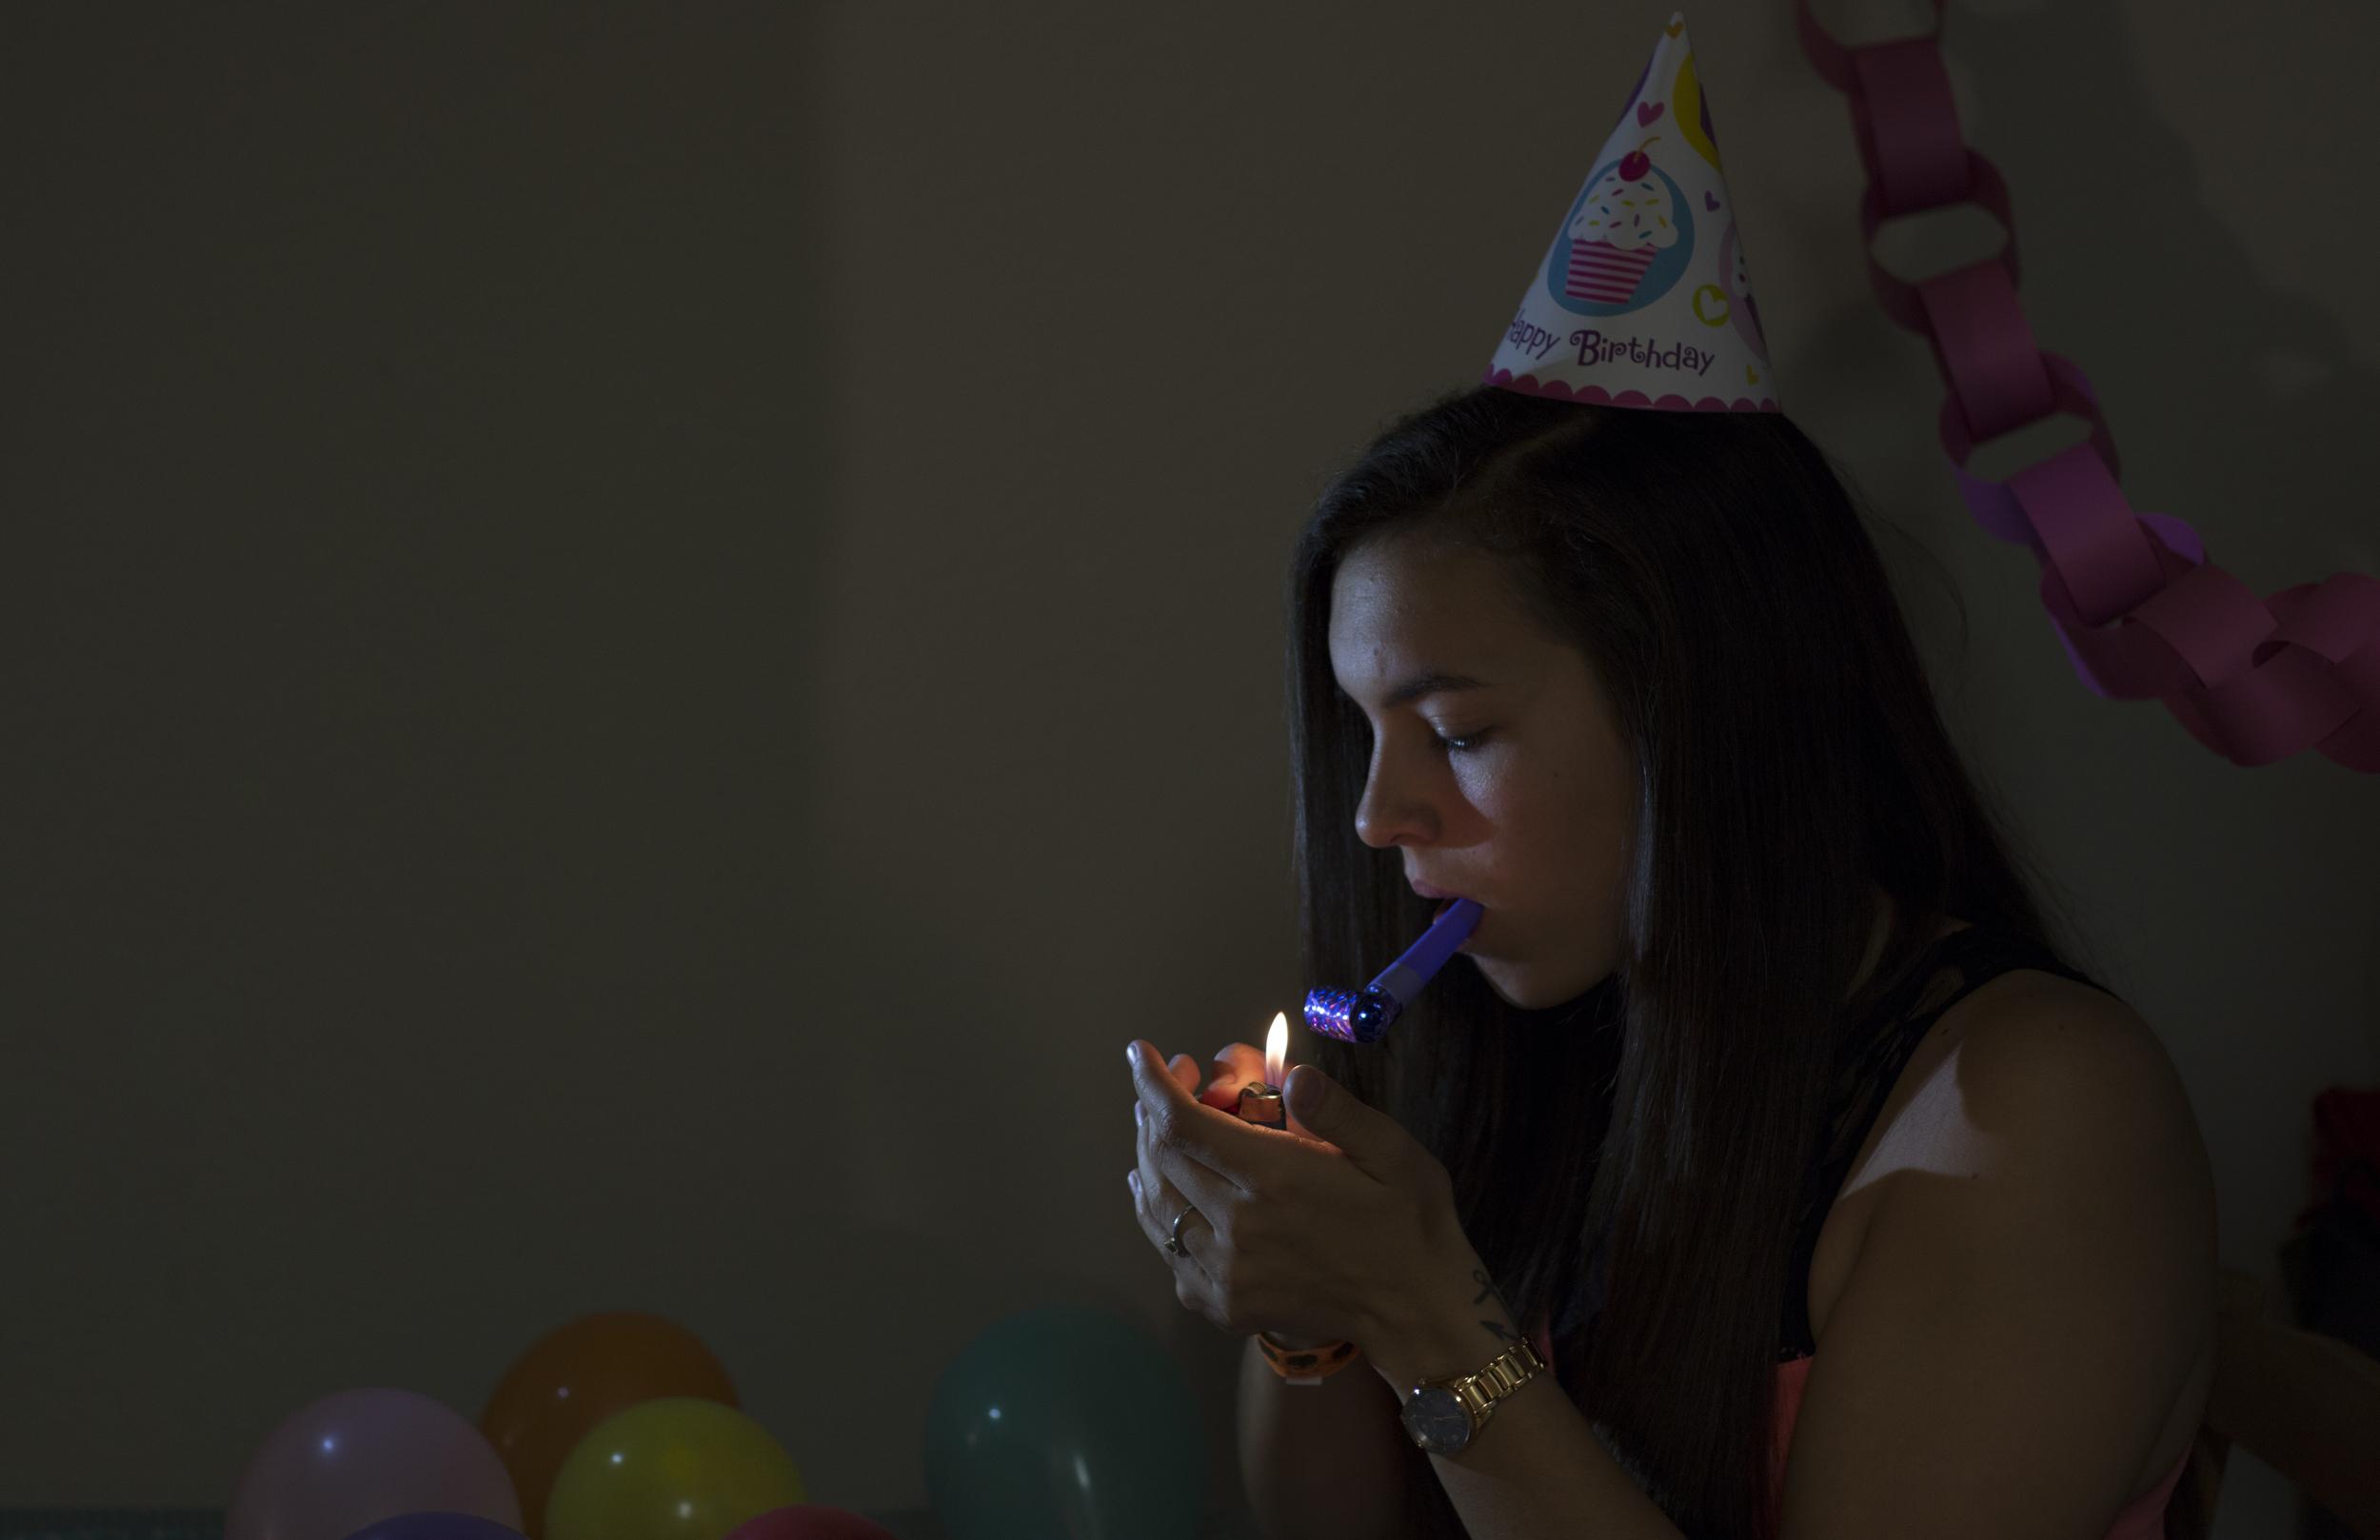 Noire Birthday Party